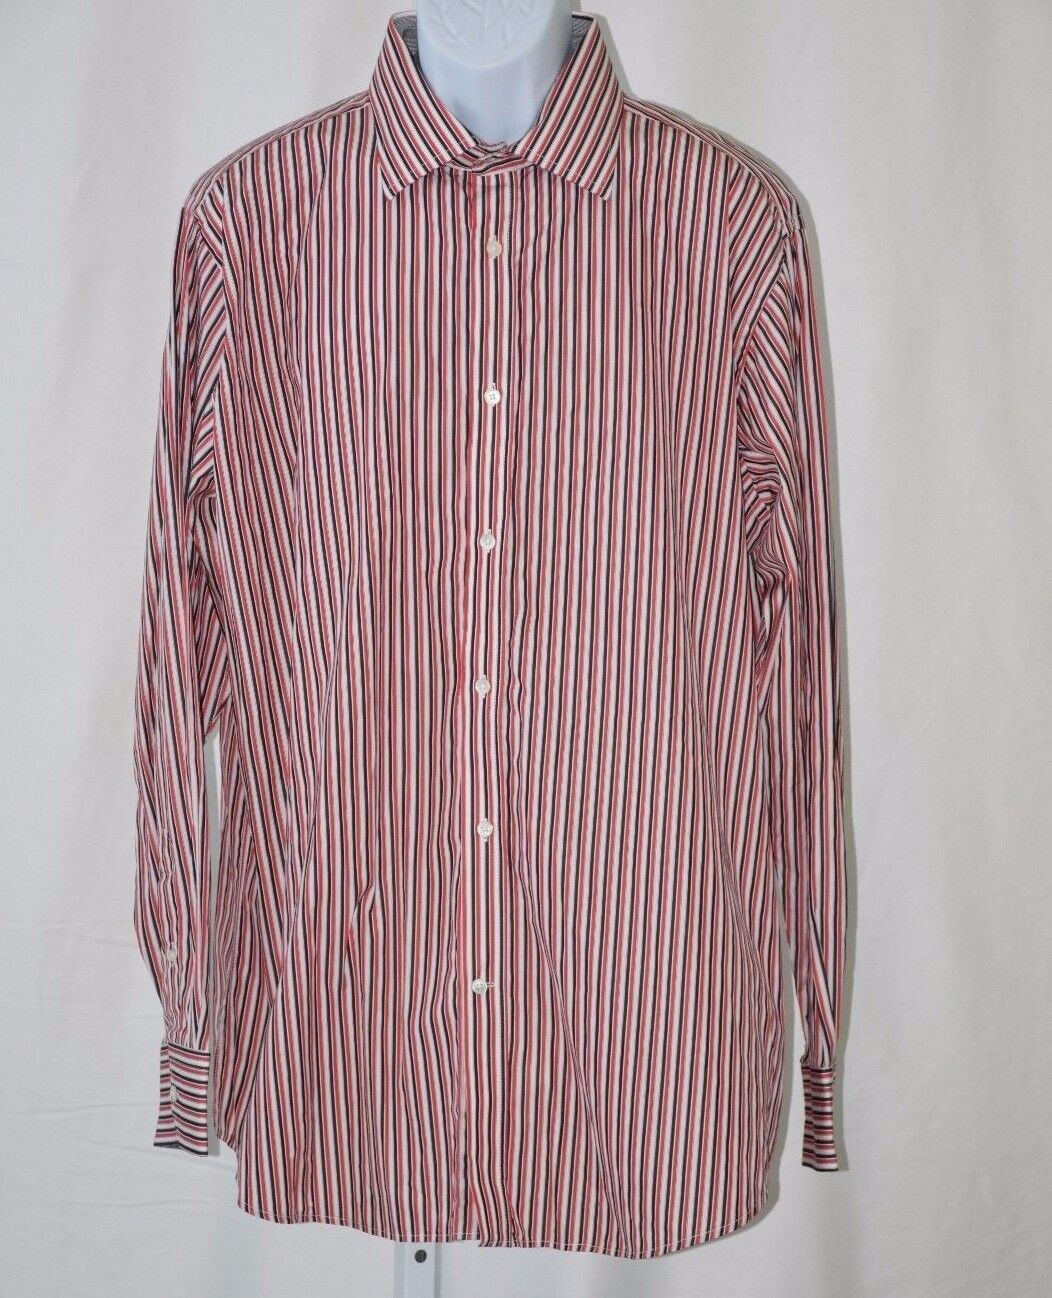 Shirt by Shirt TailoROT New York  Herren Multi Striped XL 52